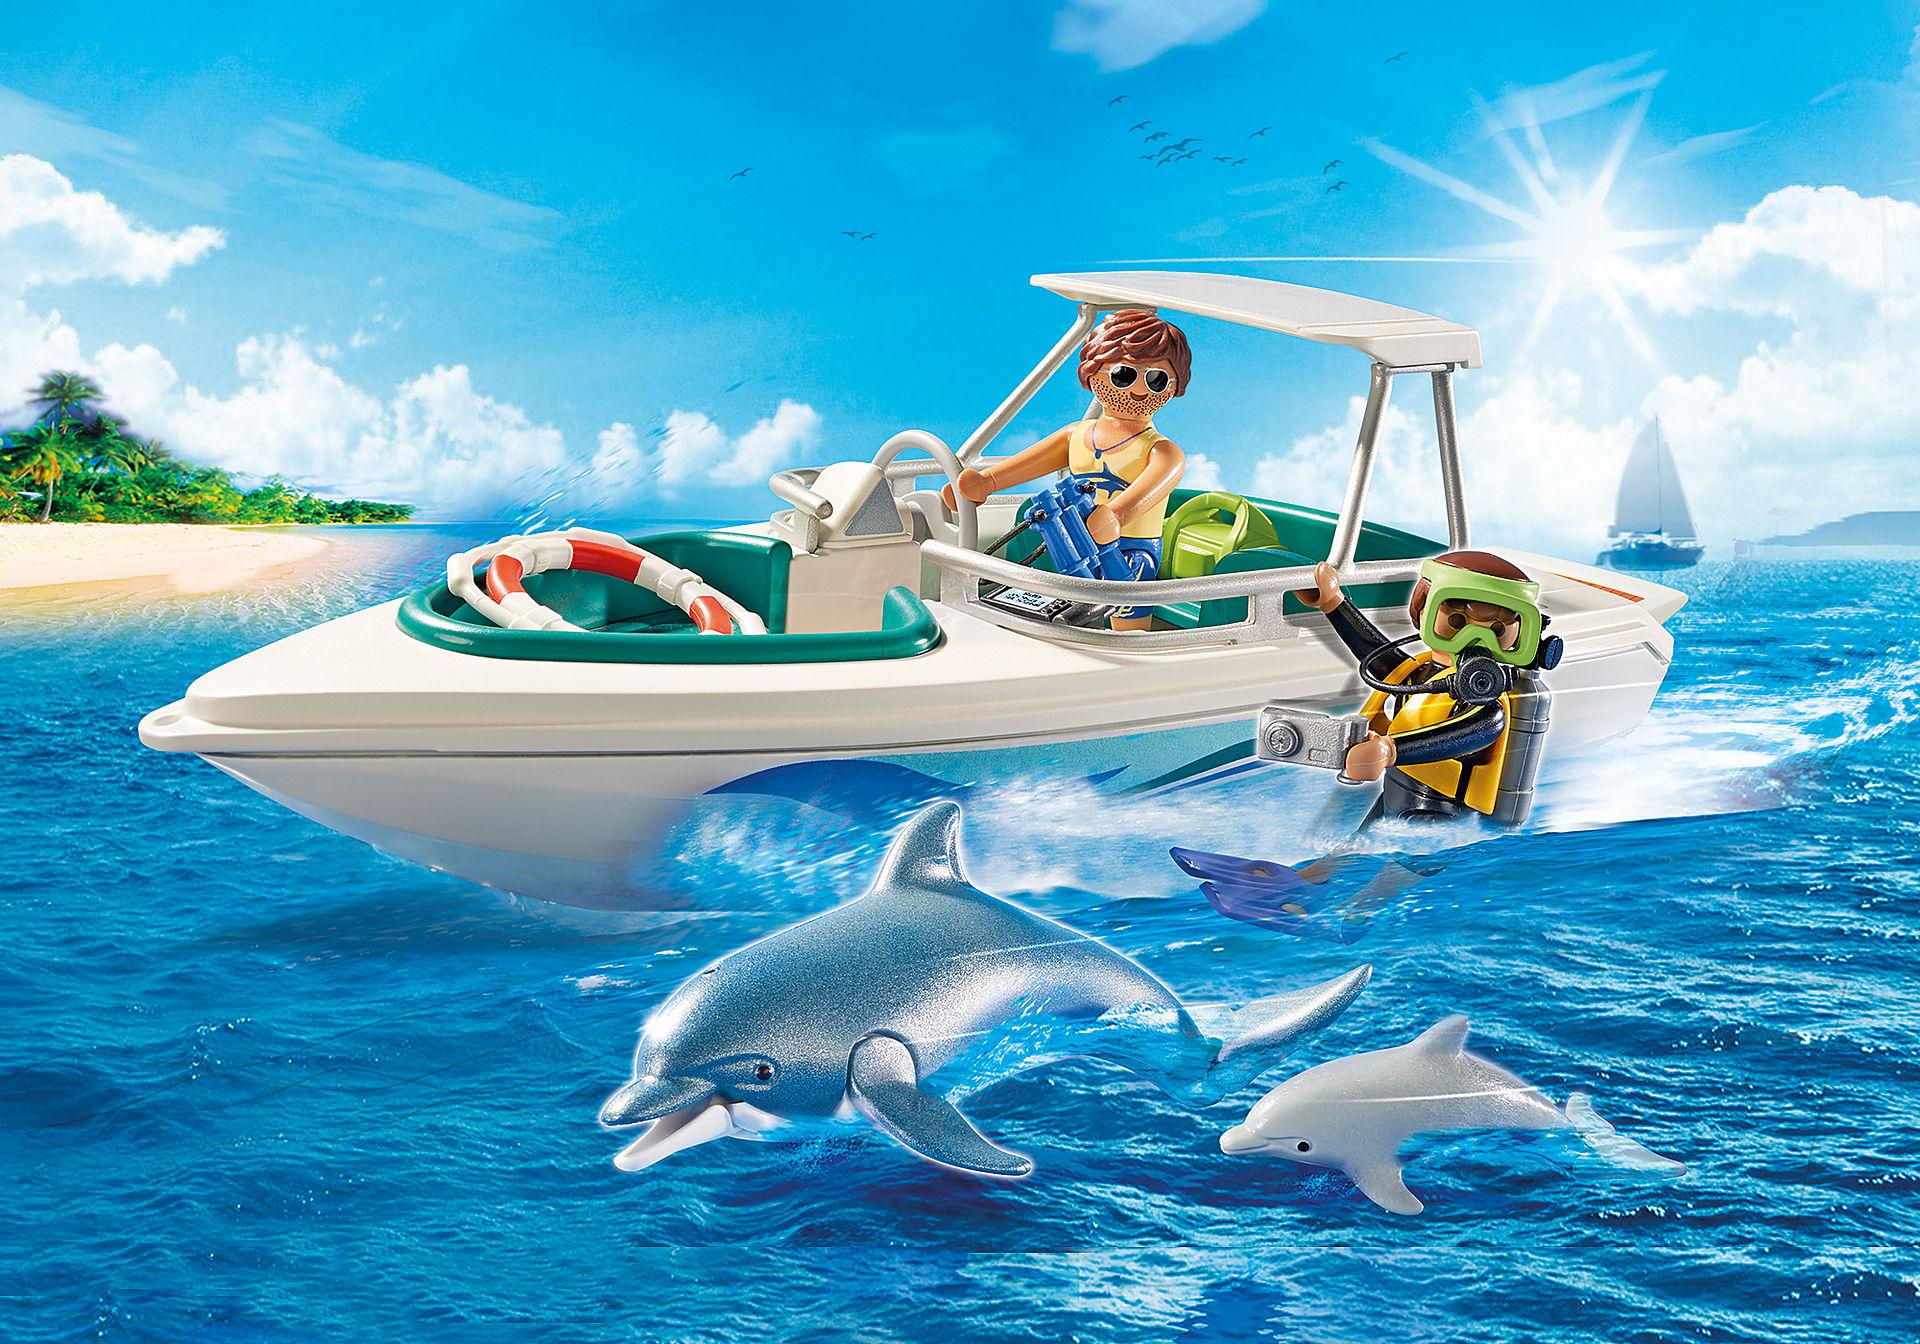 http://media.playmobil.com/i/playmobil/6981_product_detail/Tauchausflug mit Sportboot